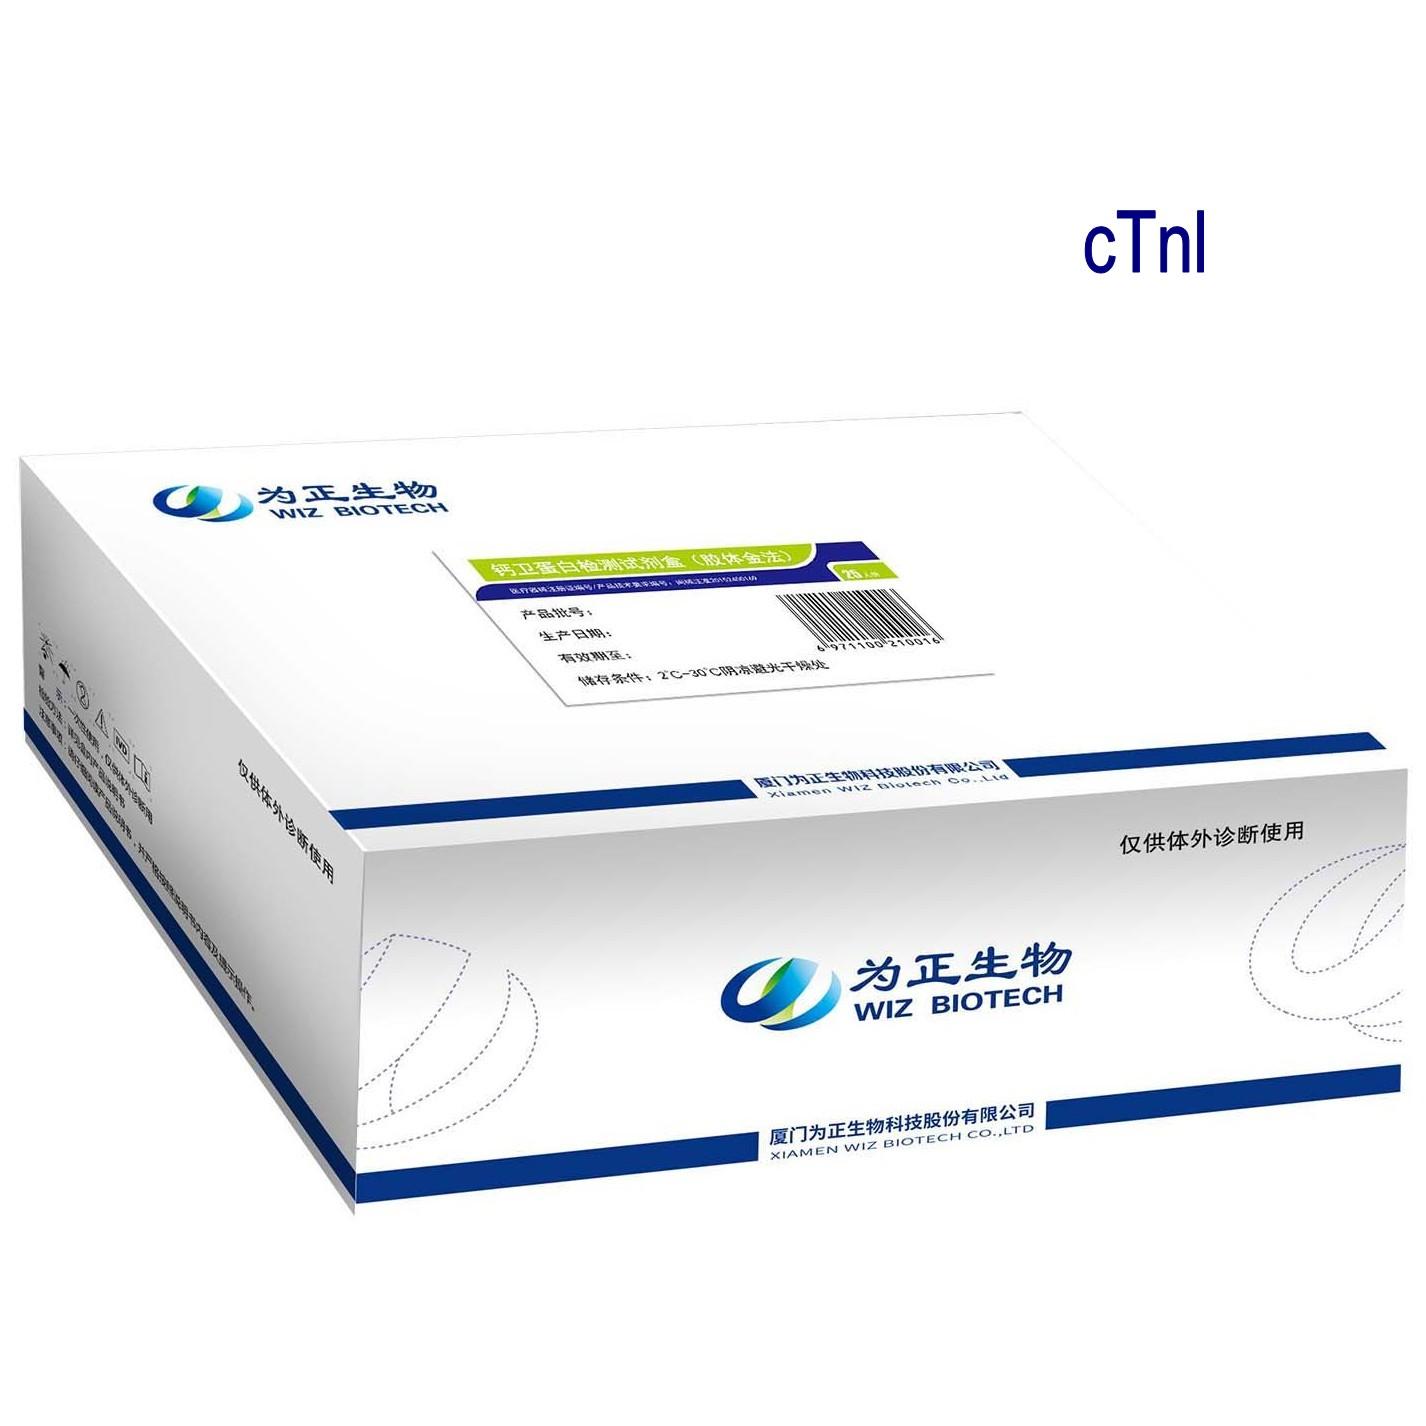 OEM Factory for Chlamydia Rapid Test Importers - Diagnostic Kit for Cardiac Troponin I (fluorescence immunochromatographic assay) – Baysen